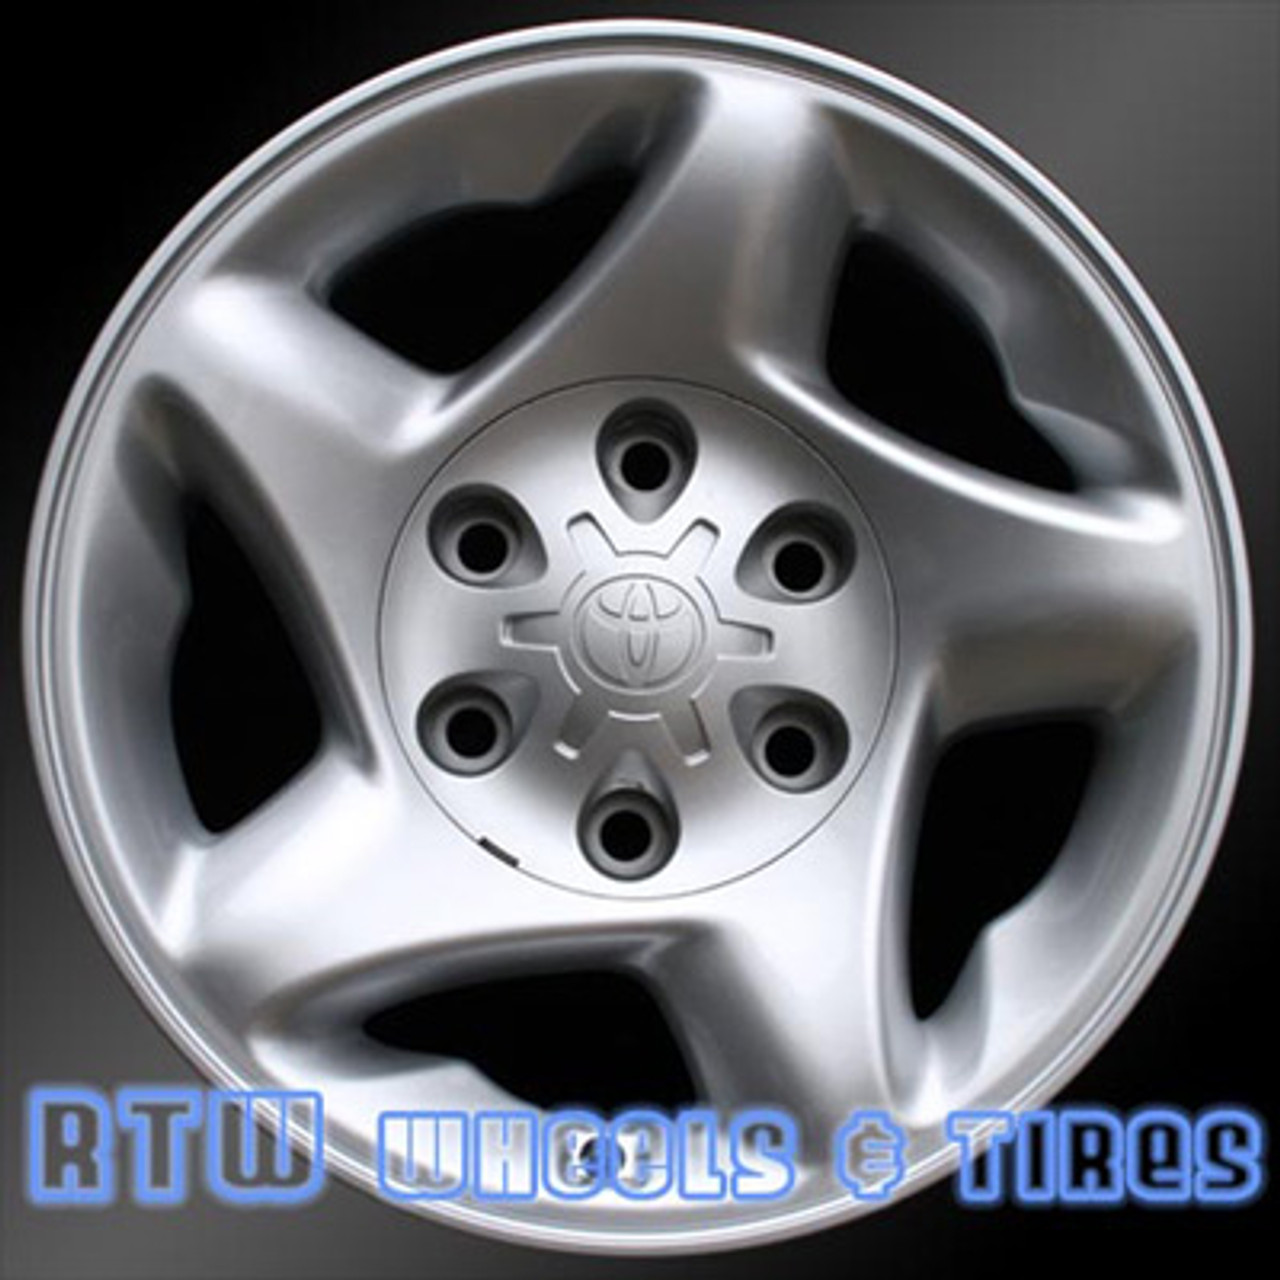 Toyota Wheels For Sale Tacoma Tundra 00 04 Silver Rims 69395